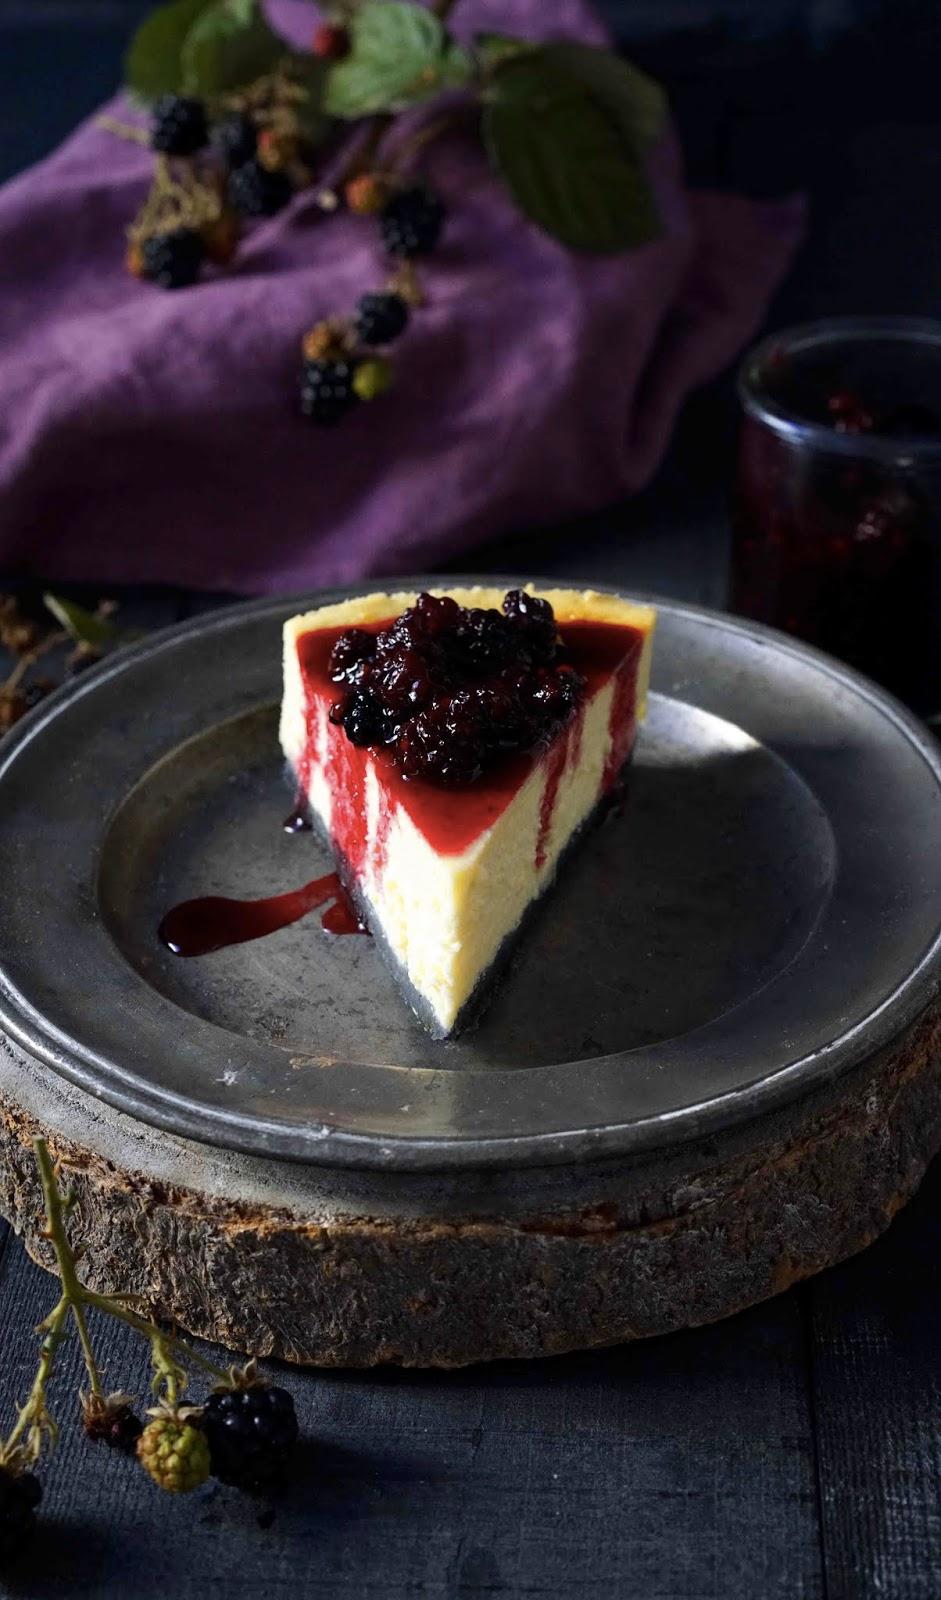 texture extra , cheesecake extra , phidelphia